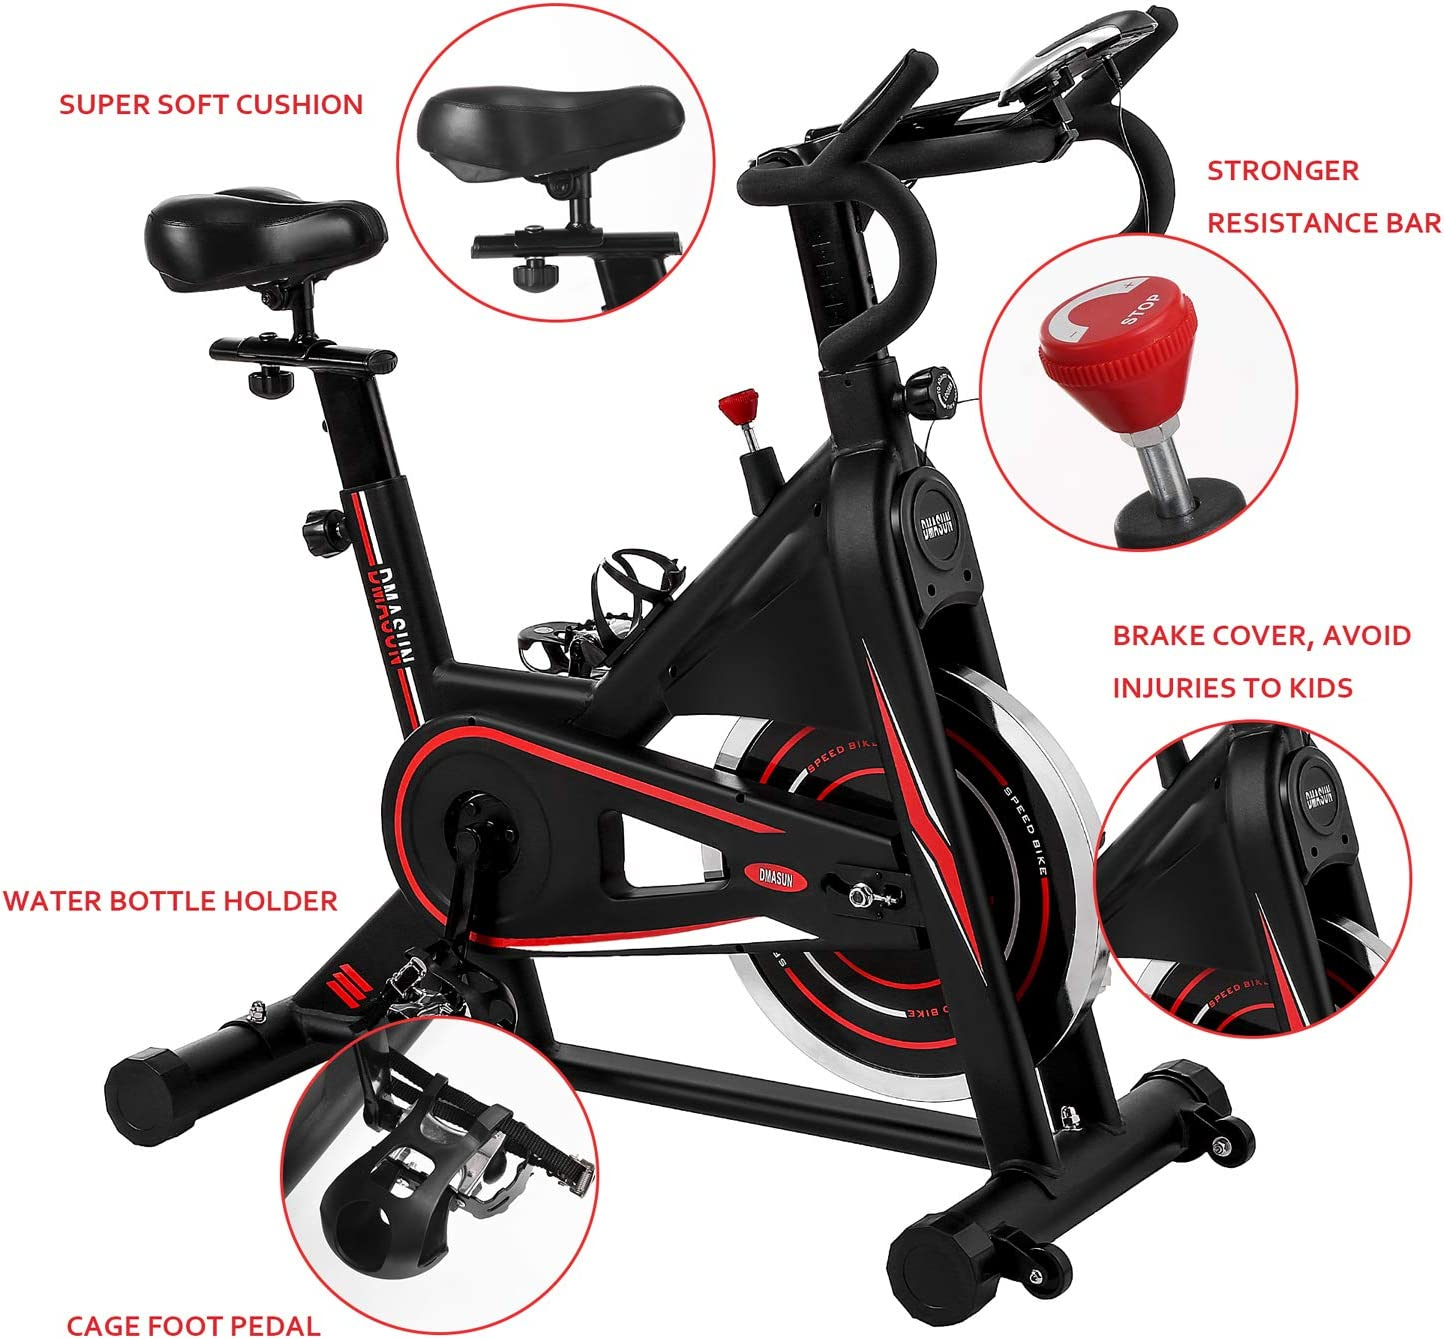 DMASUN Exercise Bike Indoor Cycling Bike Stationary 42Lbs Flywheel Upgraded Version Comfortable Seat Cushion Grips Handlebar Multi Black